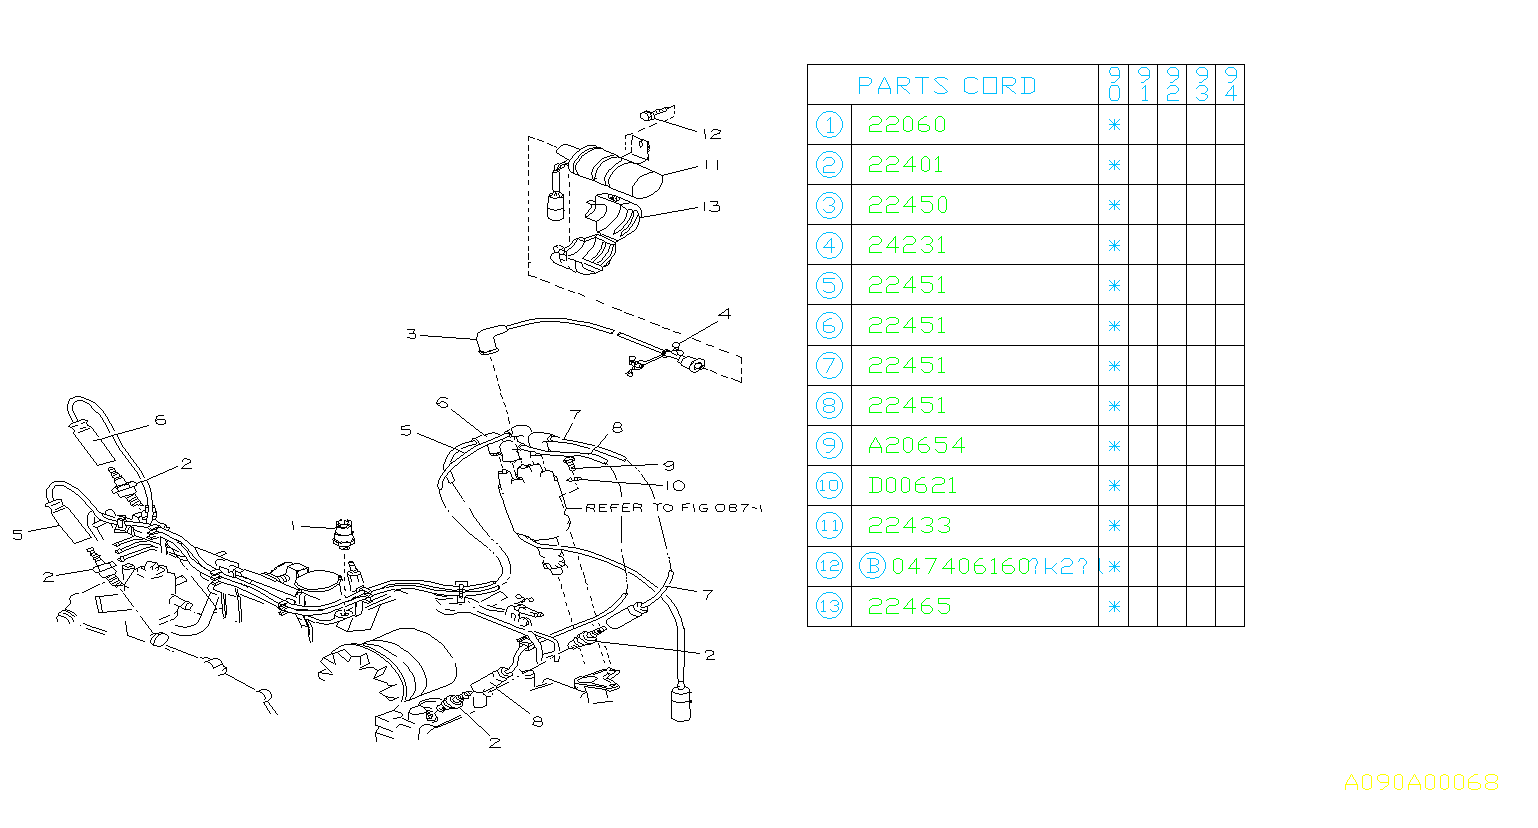 1990 subaru loyale cable complete-high tension  no 1   1  plug  spark  cord